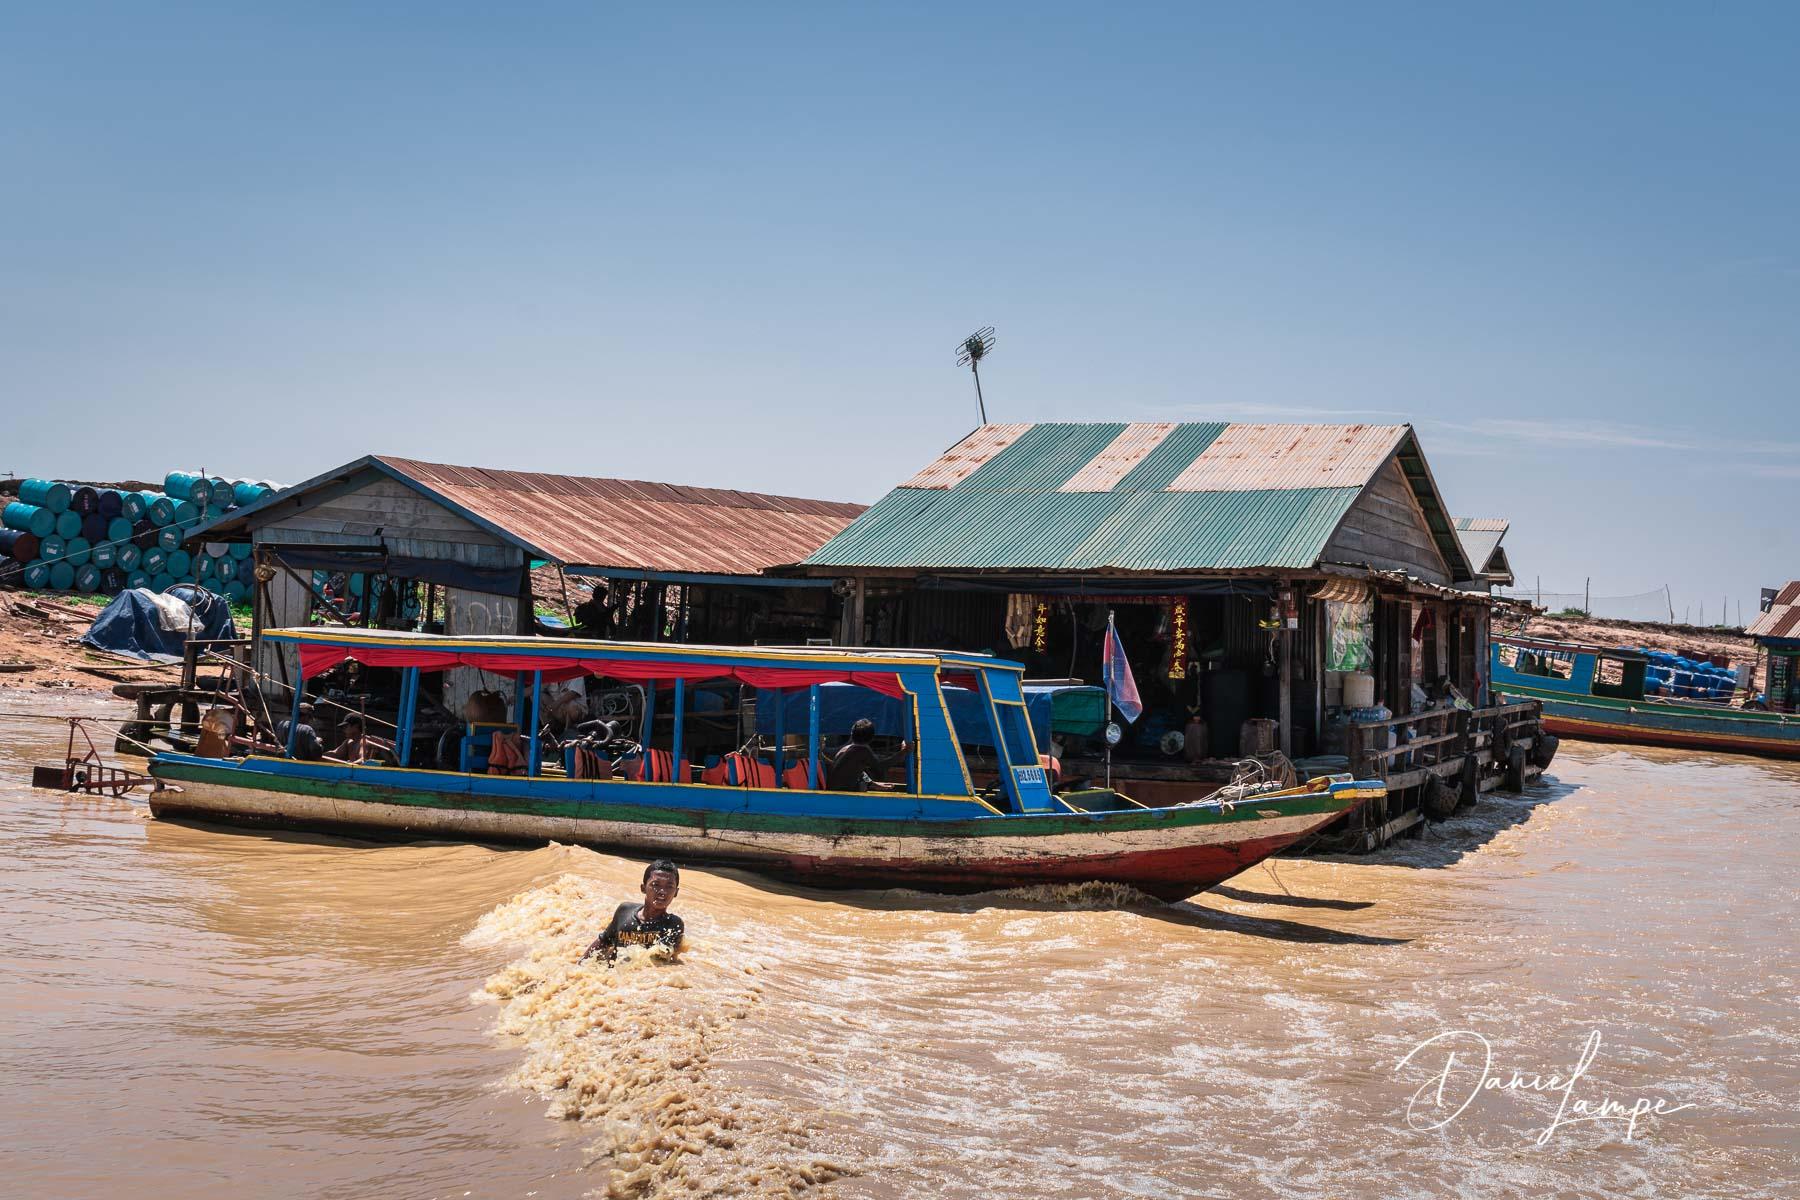 Kambodscha, Siem Reap, Siem Reap River, schwimmendes Dorf, Bootsfahrt, Junge, Baden